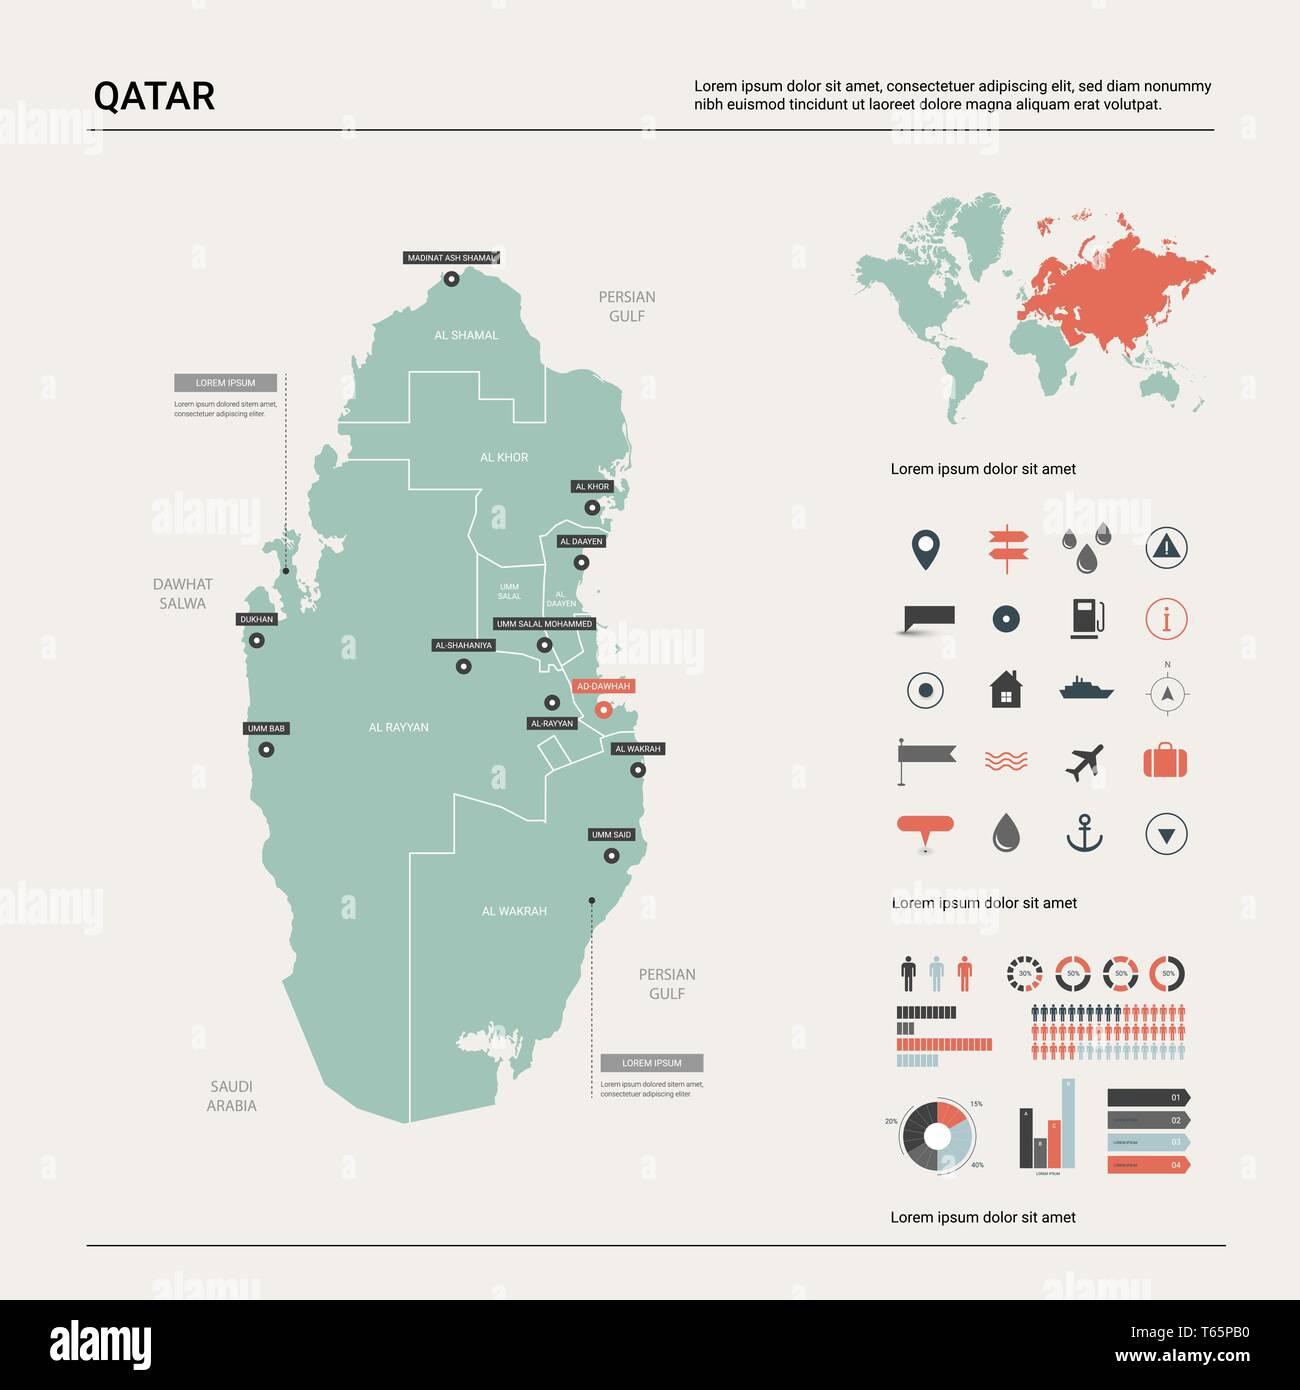 Doha Karte Welt.Qatar Political Map Stockfotos Qatar Political Map Bilder